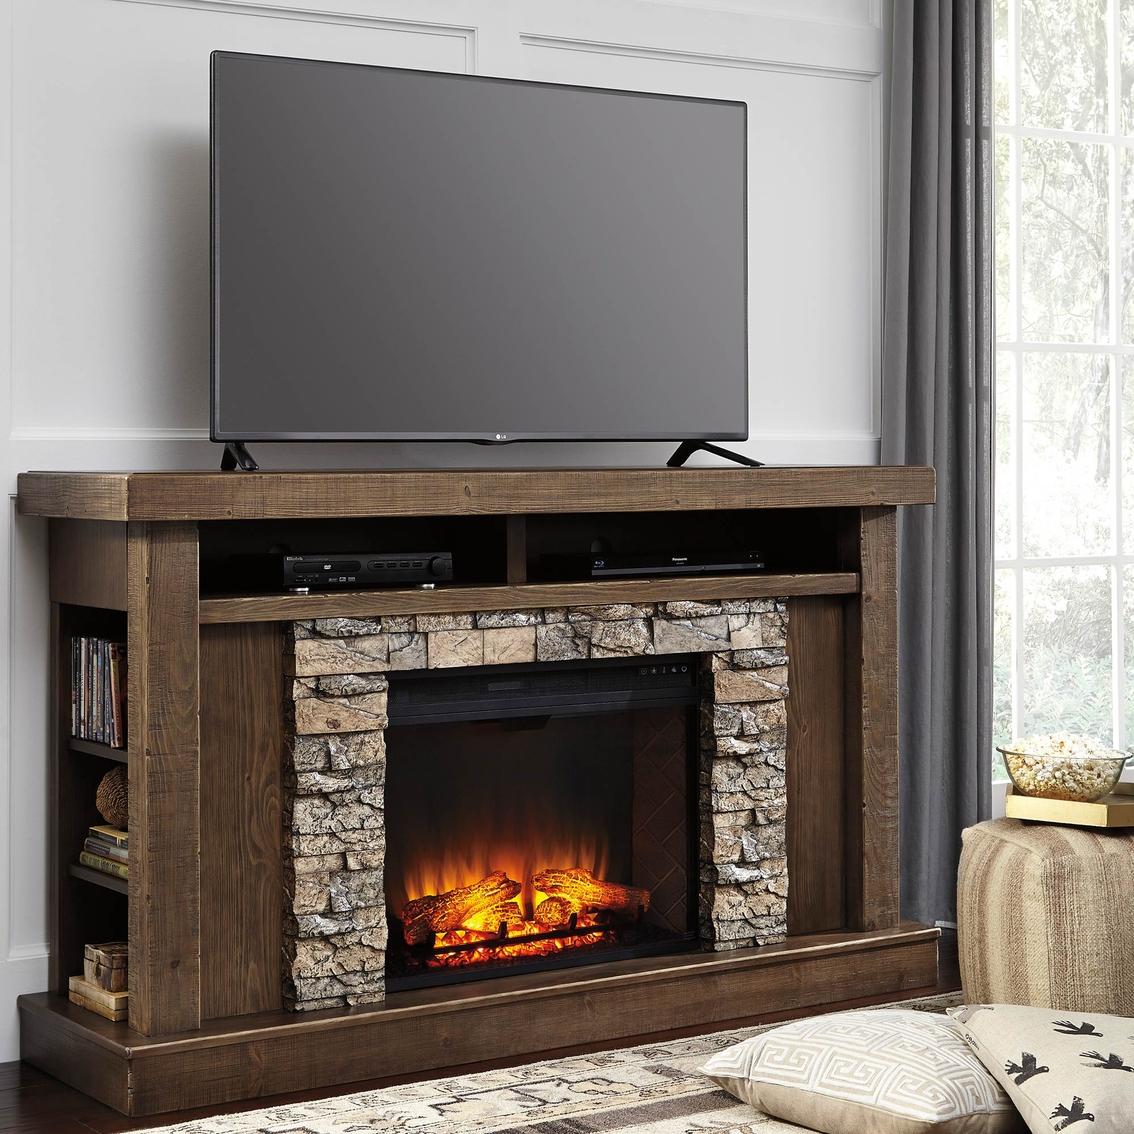 bobs furniture fireplace tv stand rejig home design